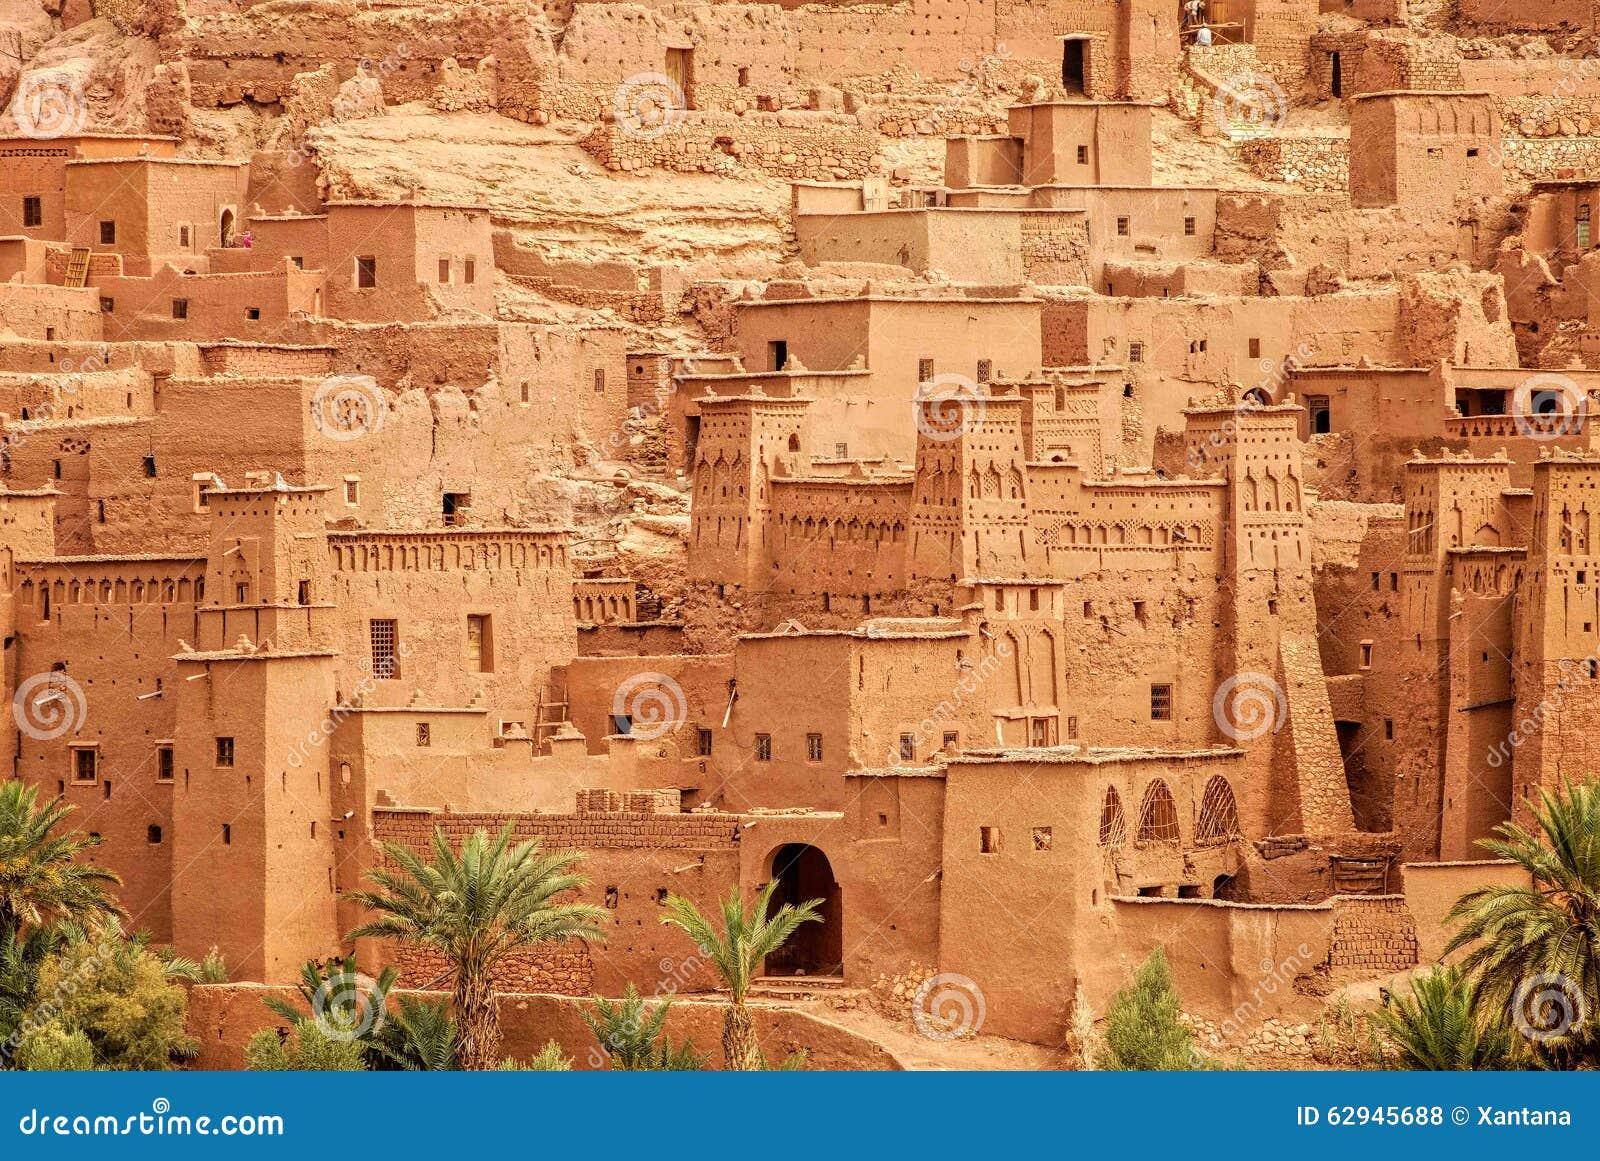 Clay kasbah Ait Benhaddou, Morocco